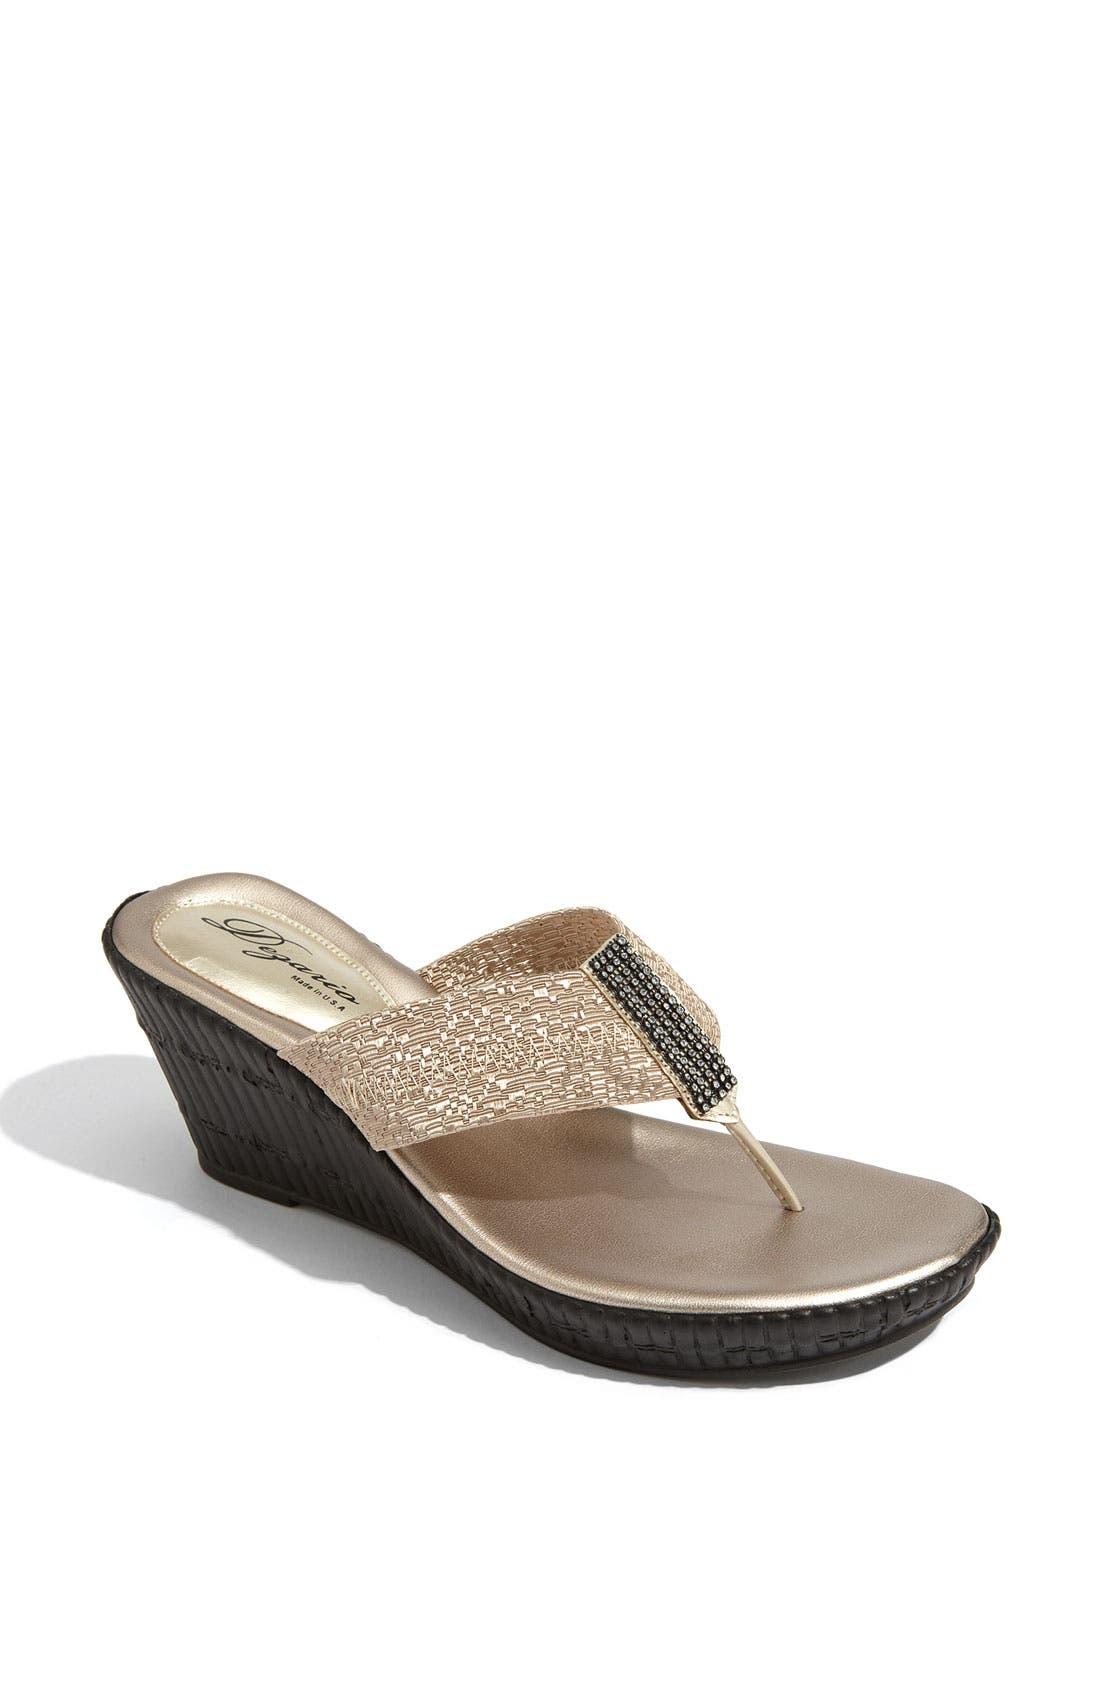 Main Image - Dezario 'Imperial' Sandal